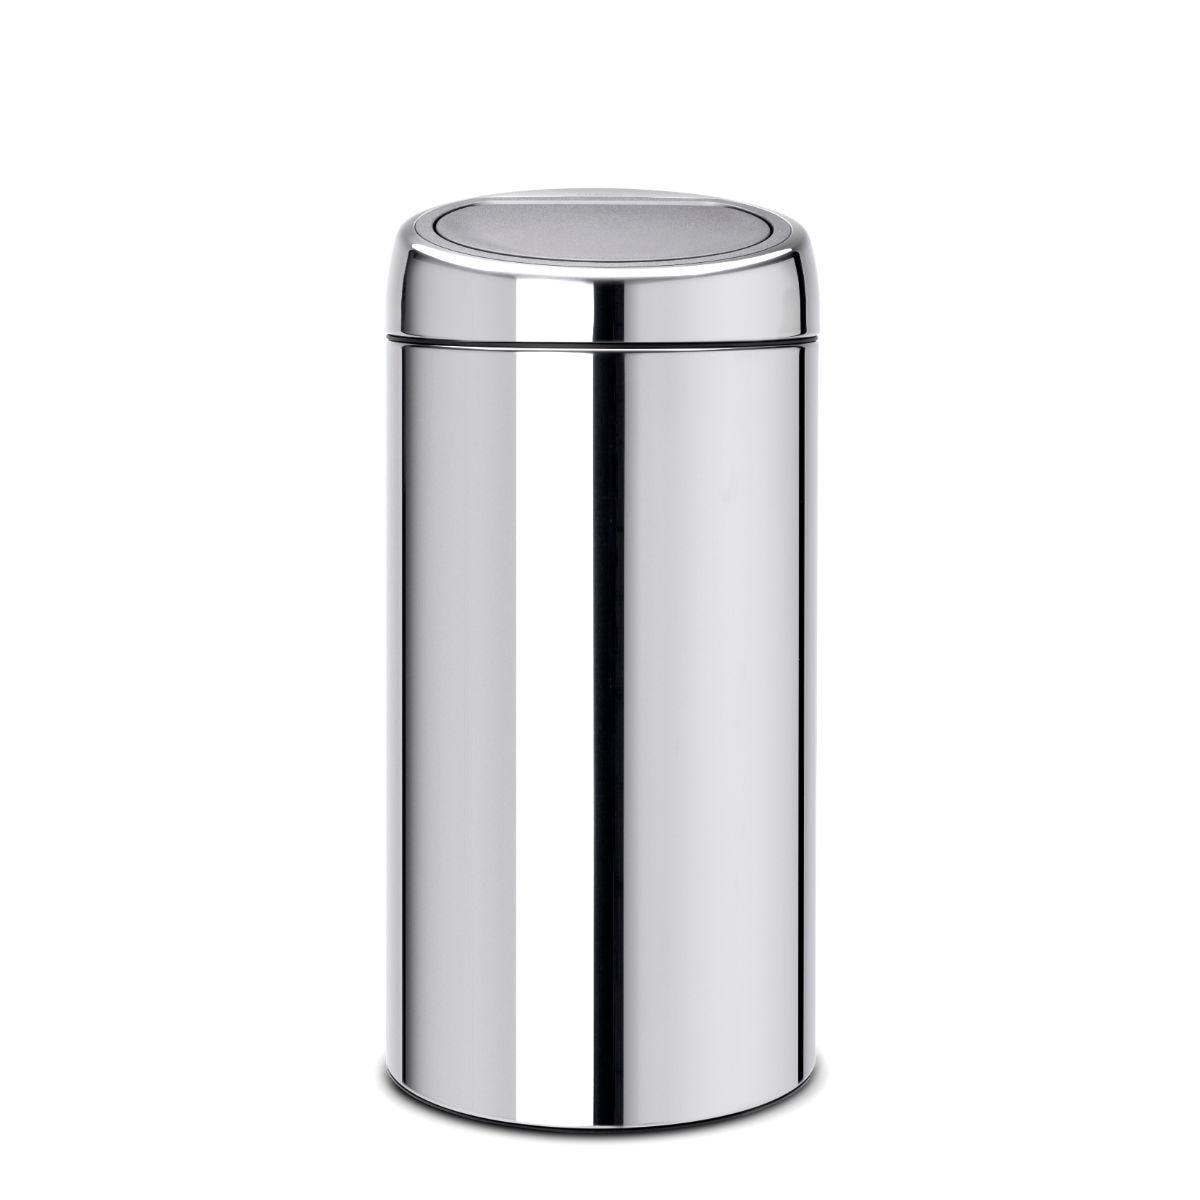 Brabantia 2 x 20L New Recycle Touch Bin - Brilliant Steel